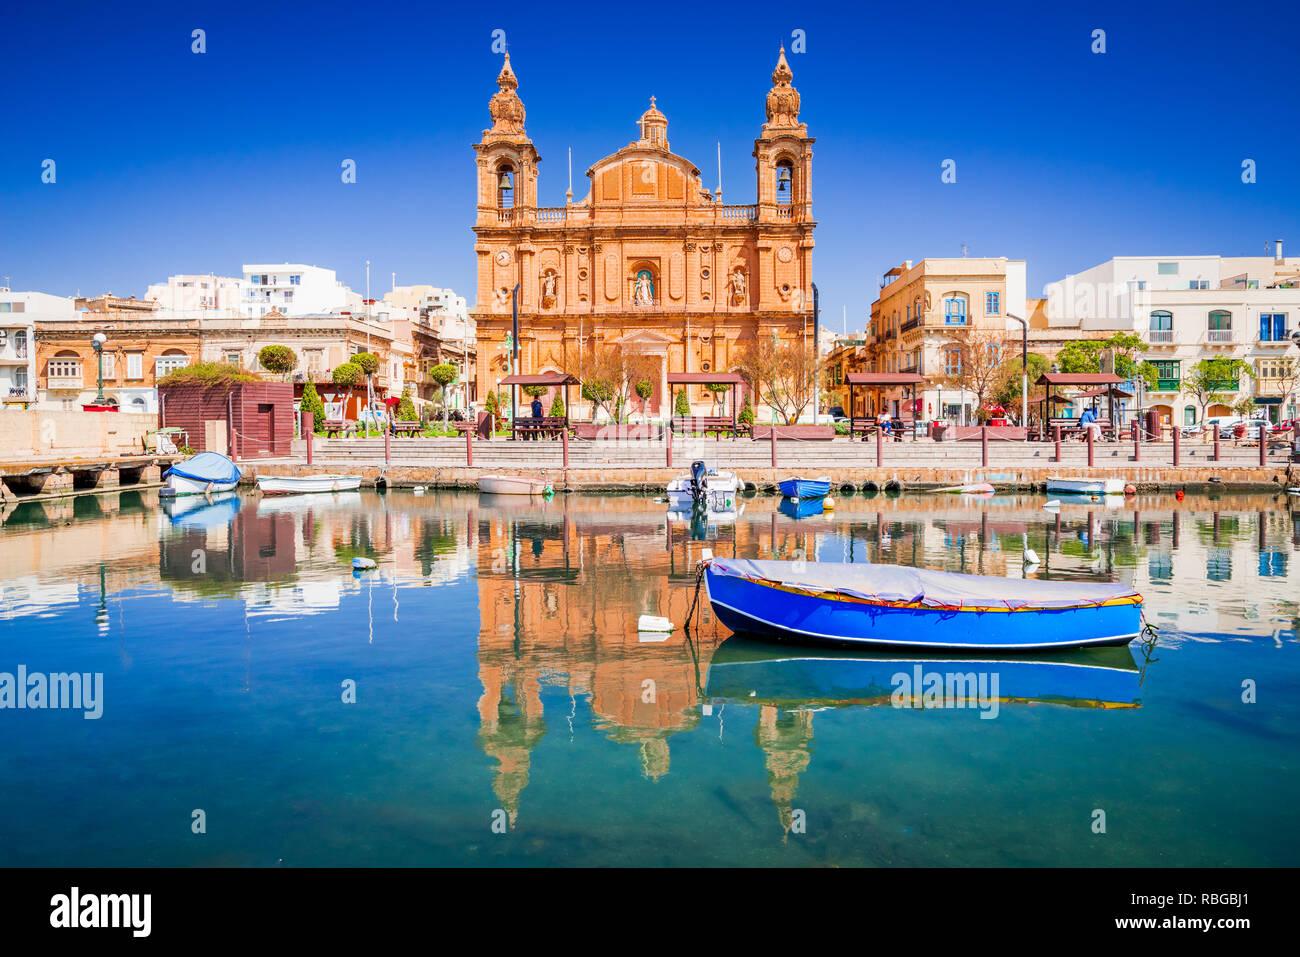 Valletta, Malta. Msida Marina boat and church reflection into water. - Stock Image